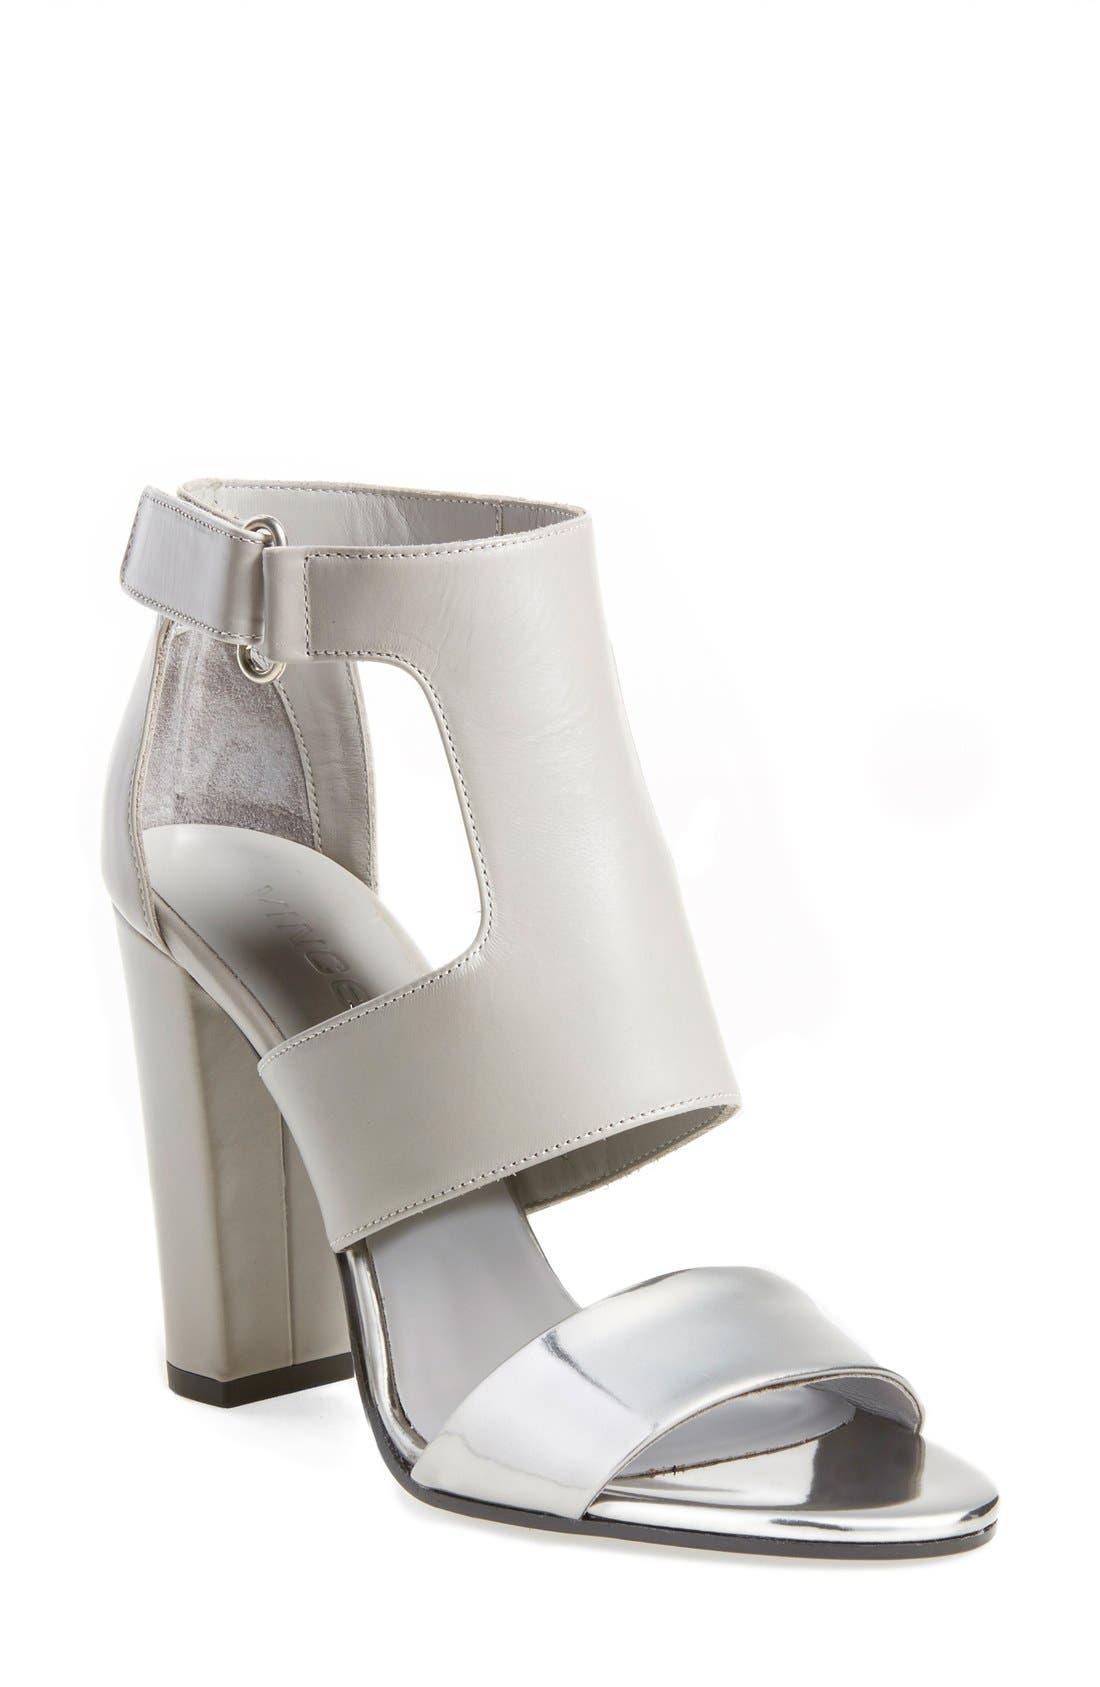 Alternate Image 1 Selected - Vince 'Aretha' Colorblock Sandal (Women)